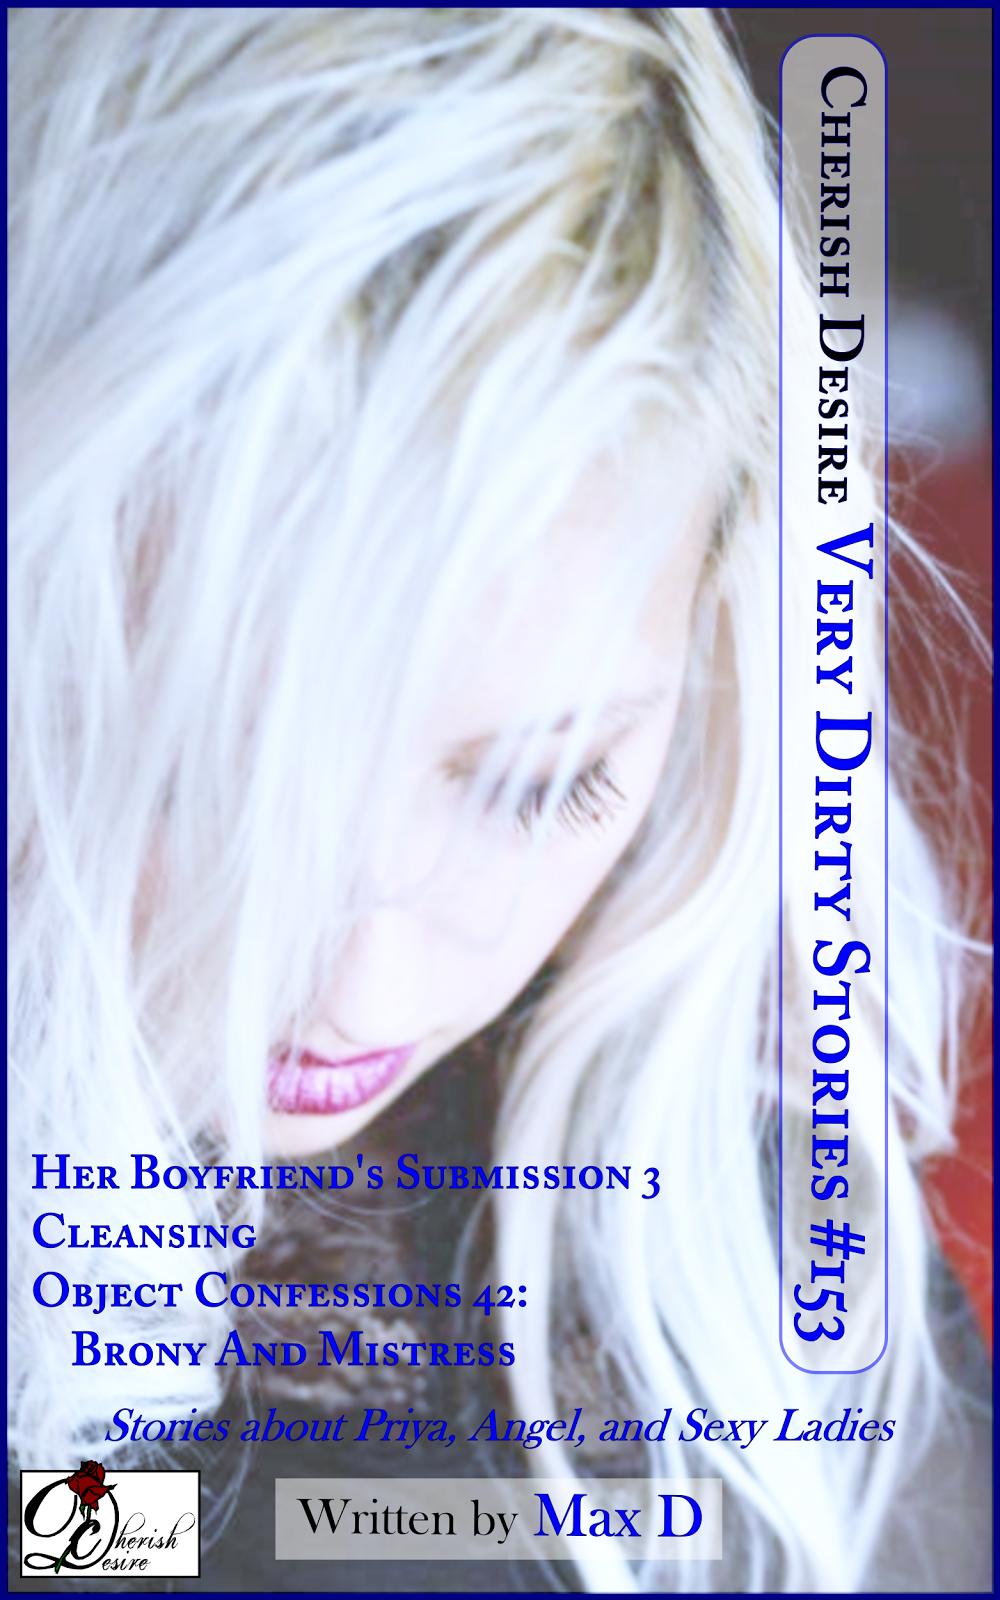 Cherish Desire: Very Dirty Stories #153, Max D, erotica